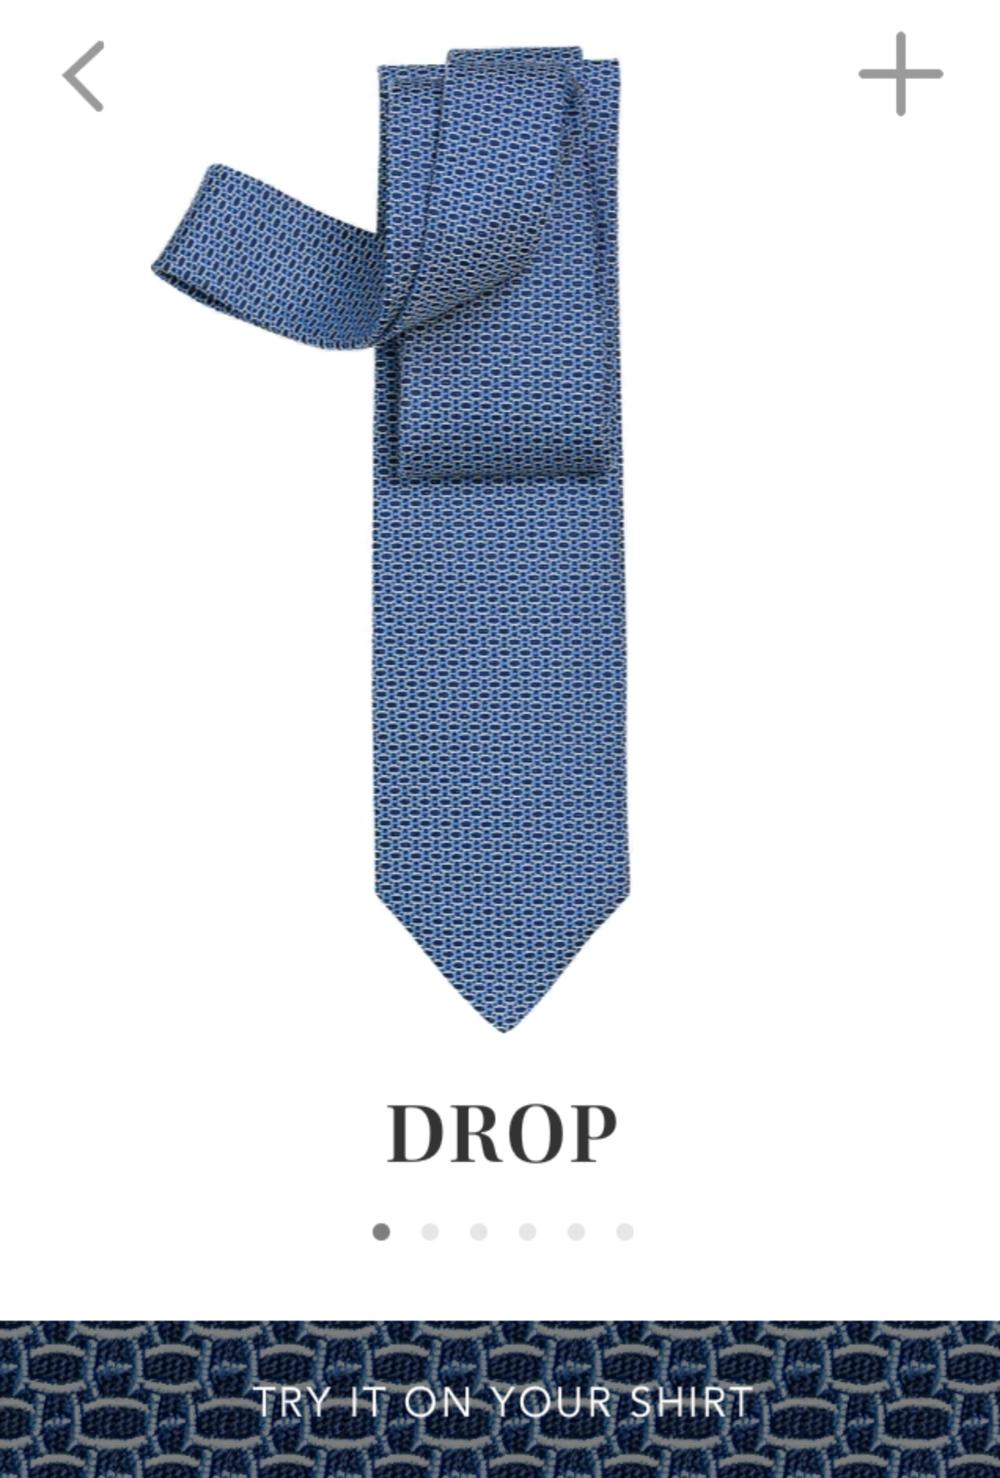 tie-break-o-novo-app-da-hermes-aplicativo-gravata-neckwear-estilo-alexandre-taleb-2.png